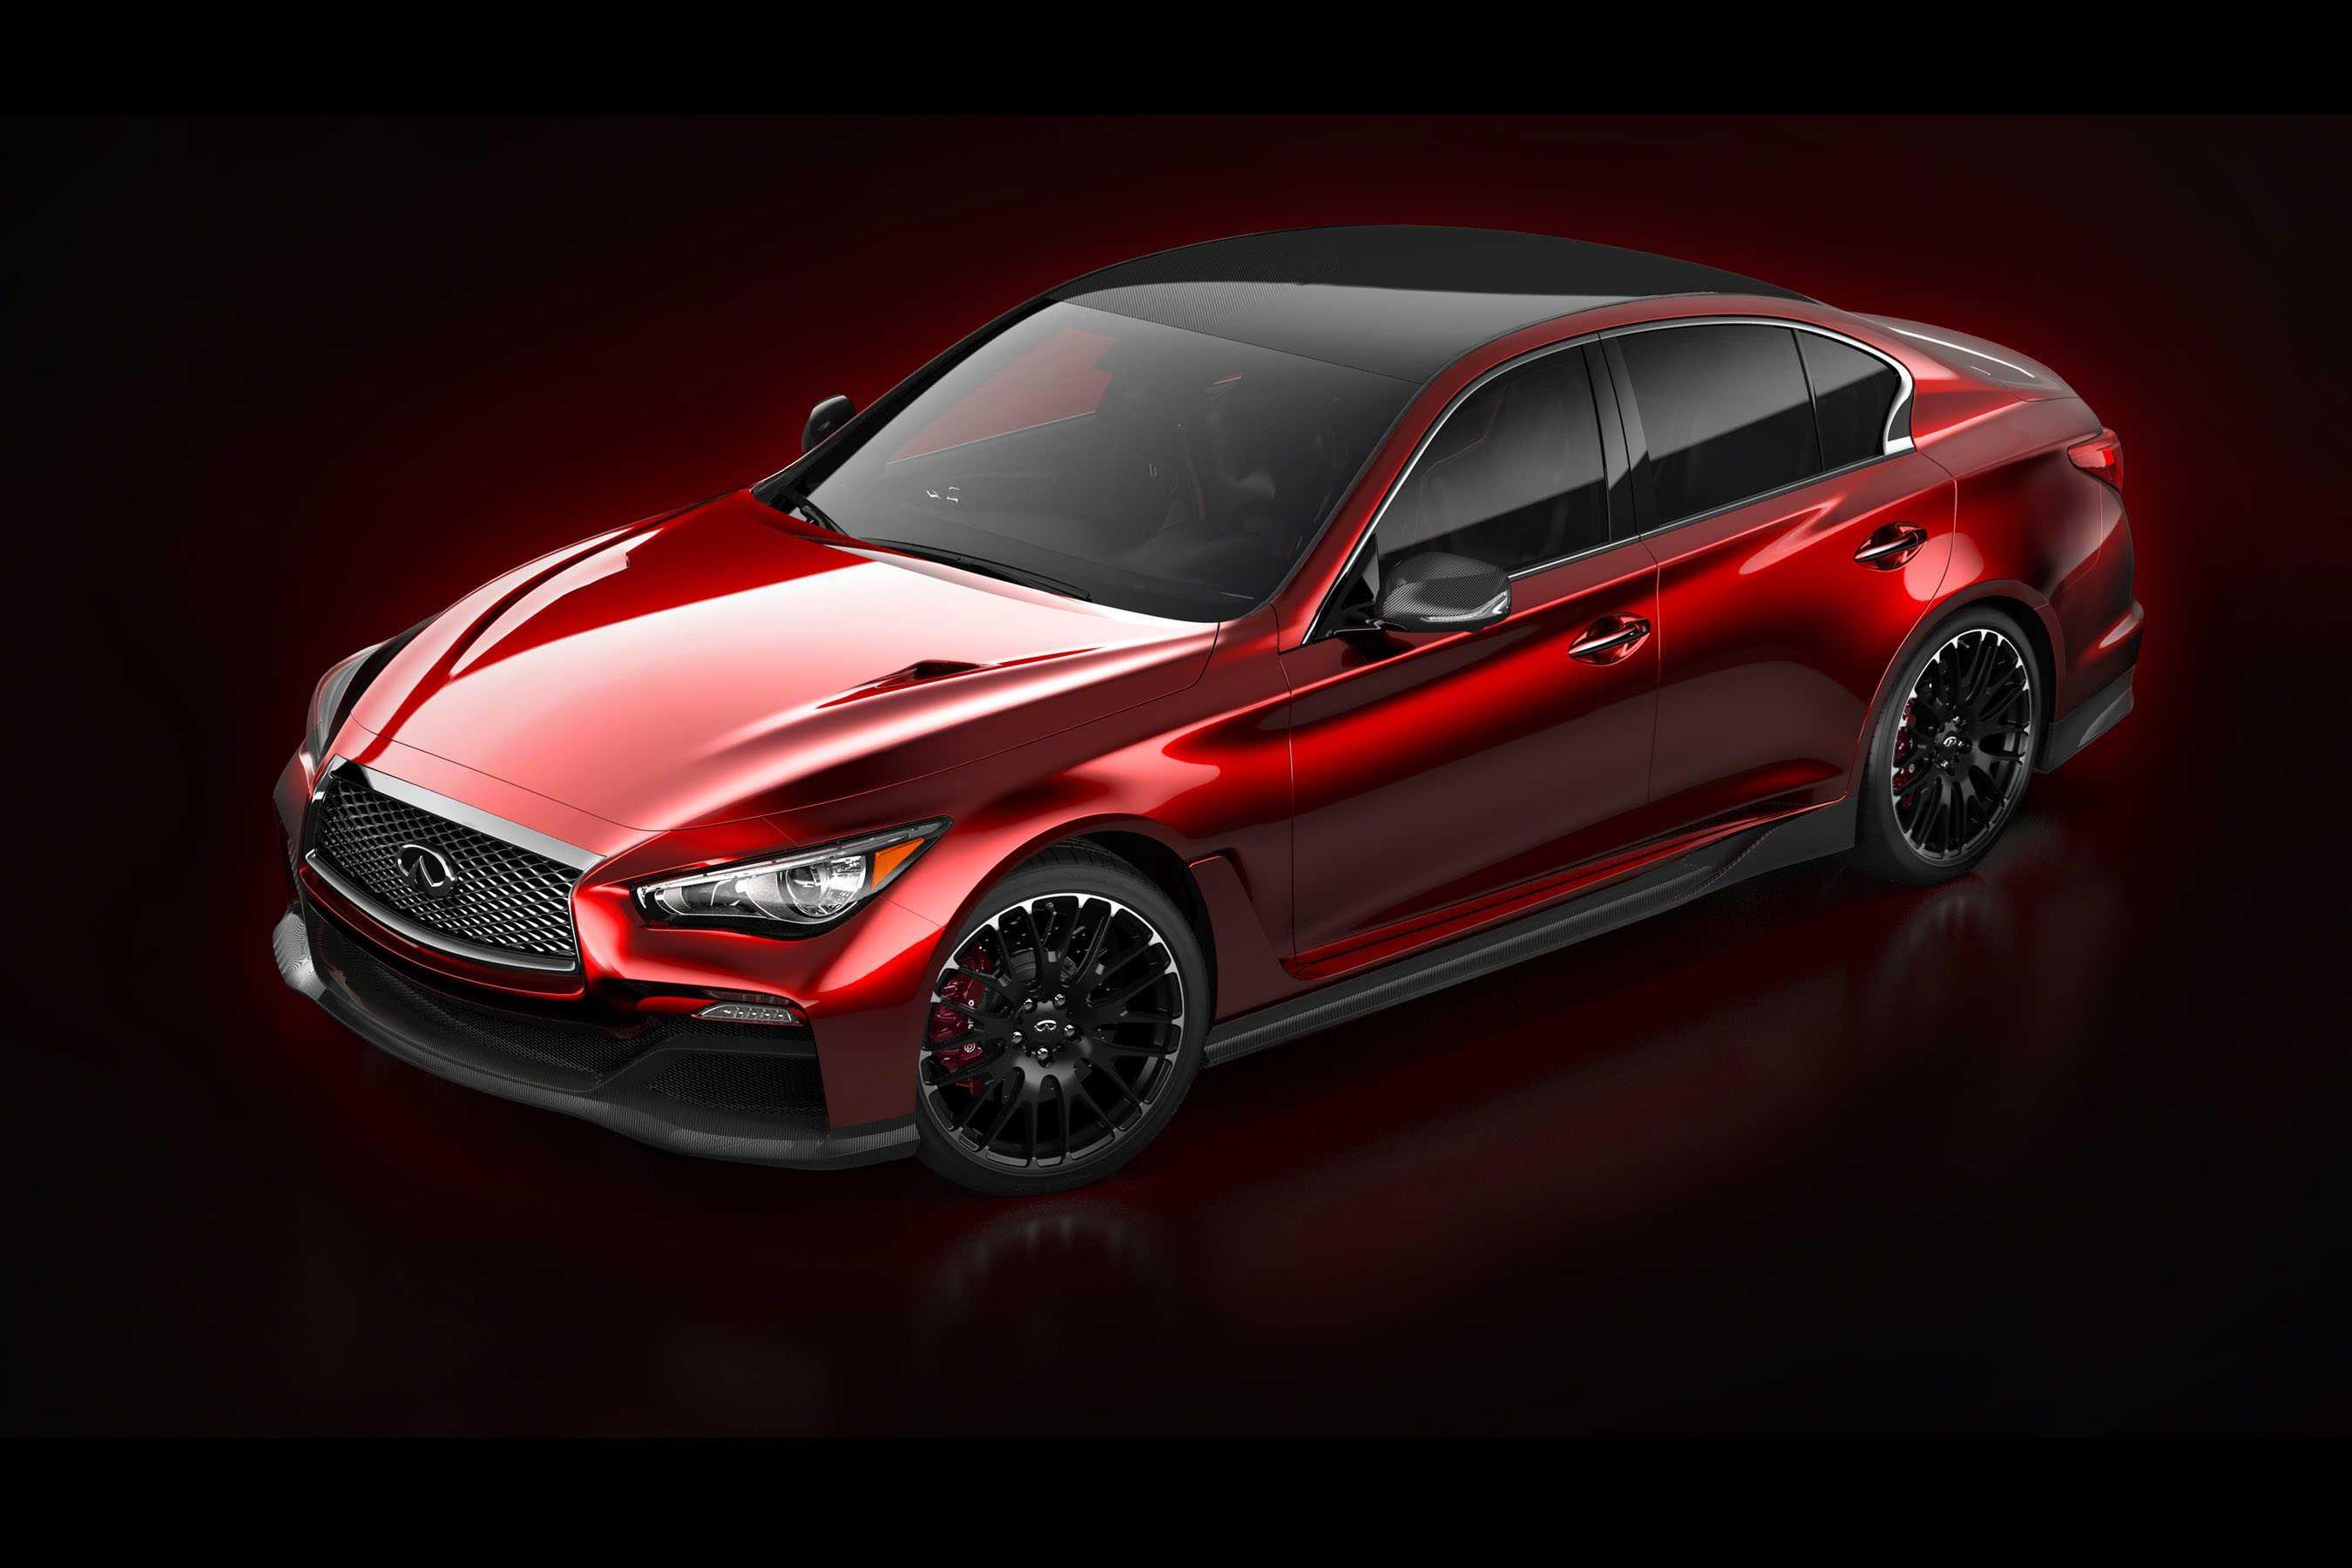 Infiniti Shows Racy Q50 Concept: Latest News – Surf4cars